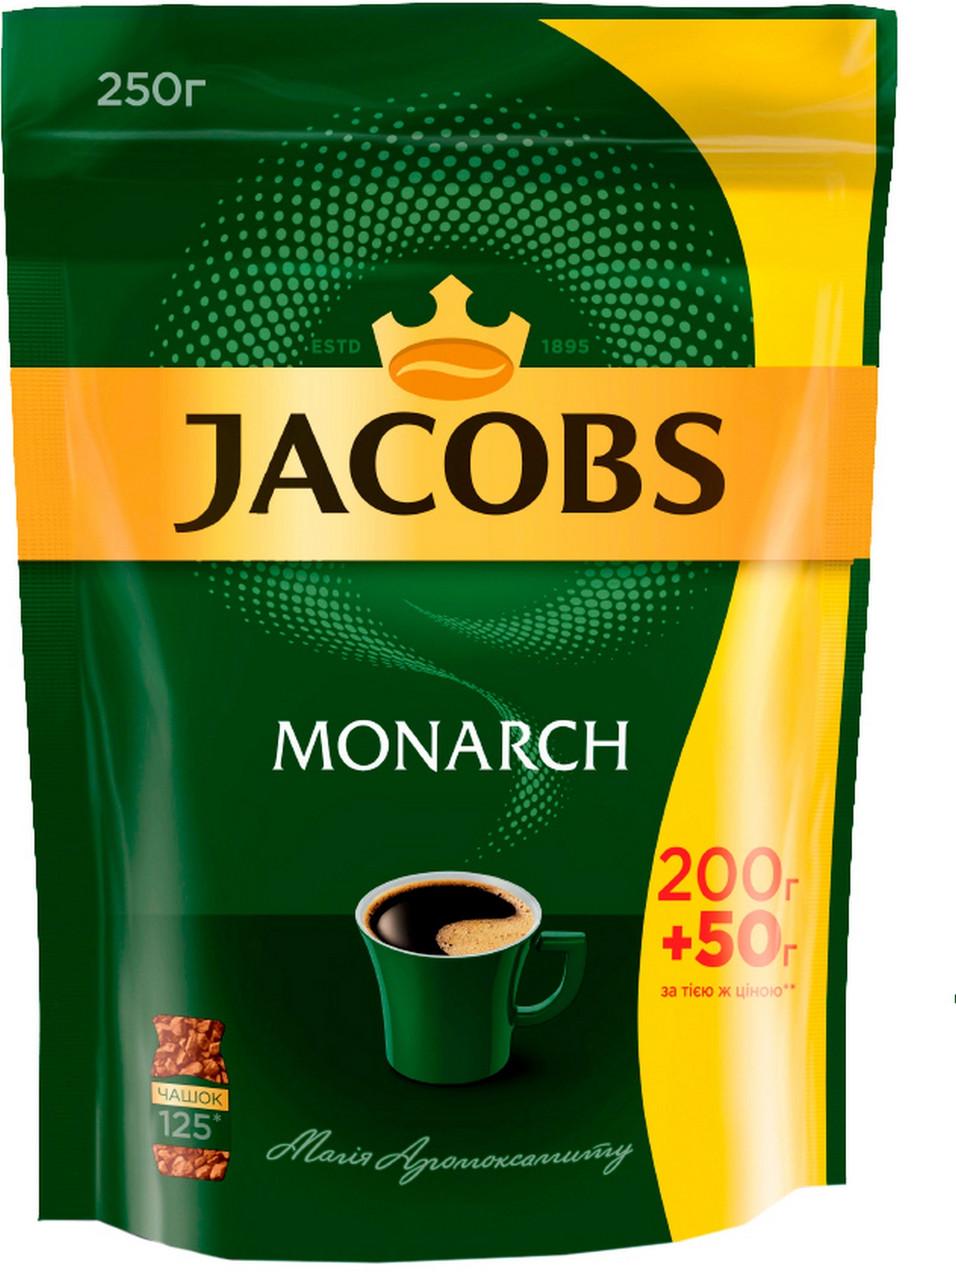 JACOBS MONARCH 250г (ЯКОБС МОНАРХ 250г)